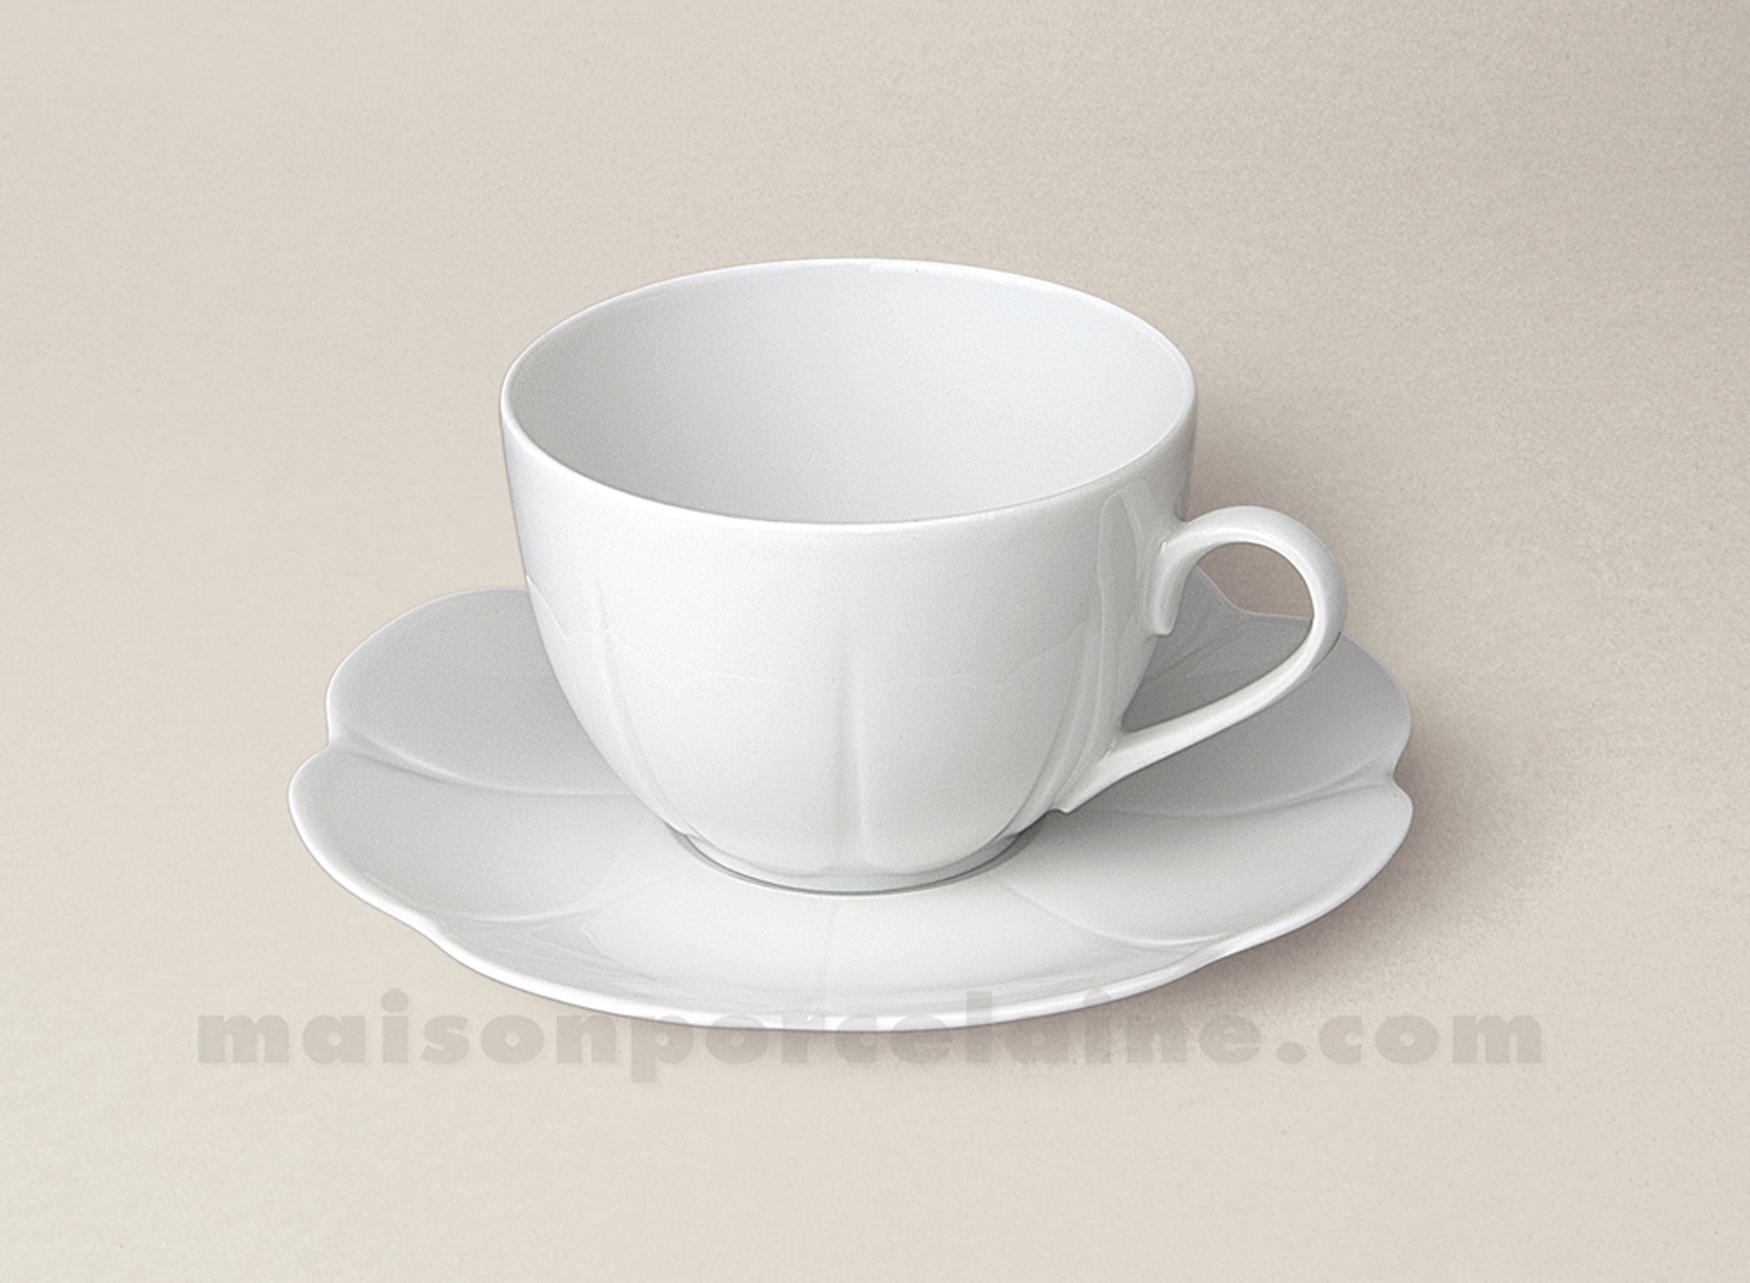 tasse the soucoupe limoges porcelaine blanche nymphea 14cl. Black Bedroom Furniture Sets. Home Design Ideas